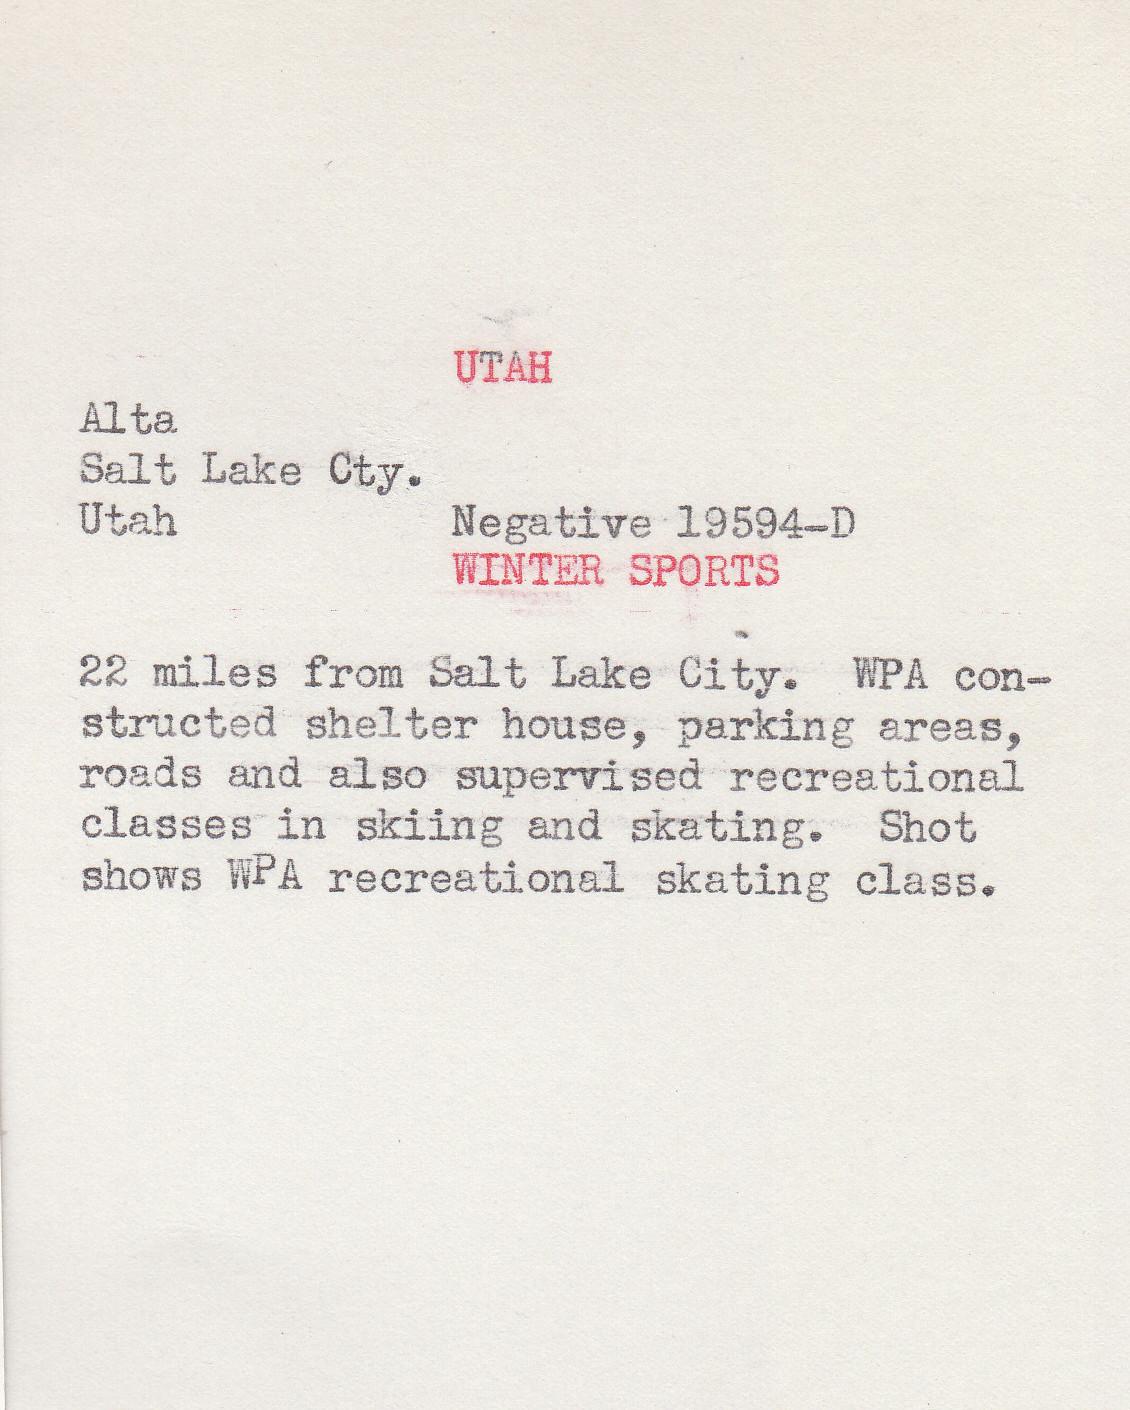 WPA Record detail